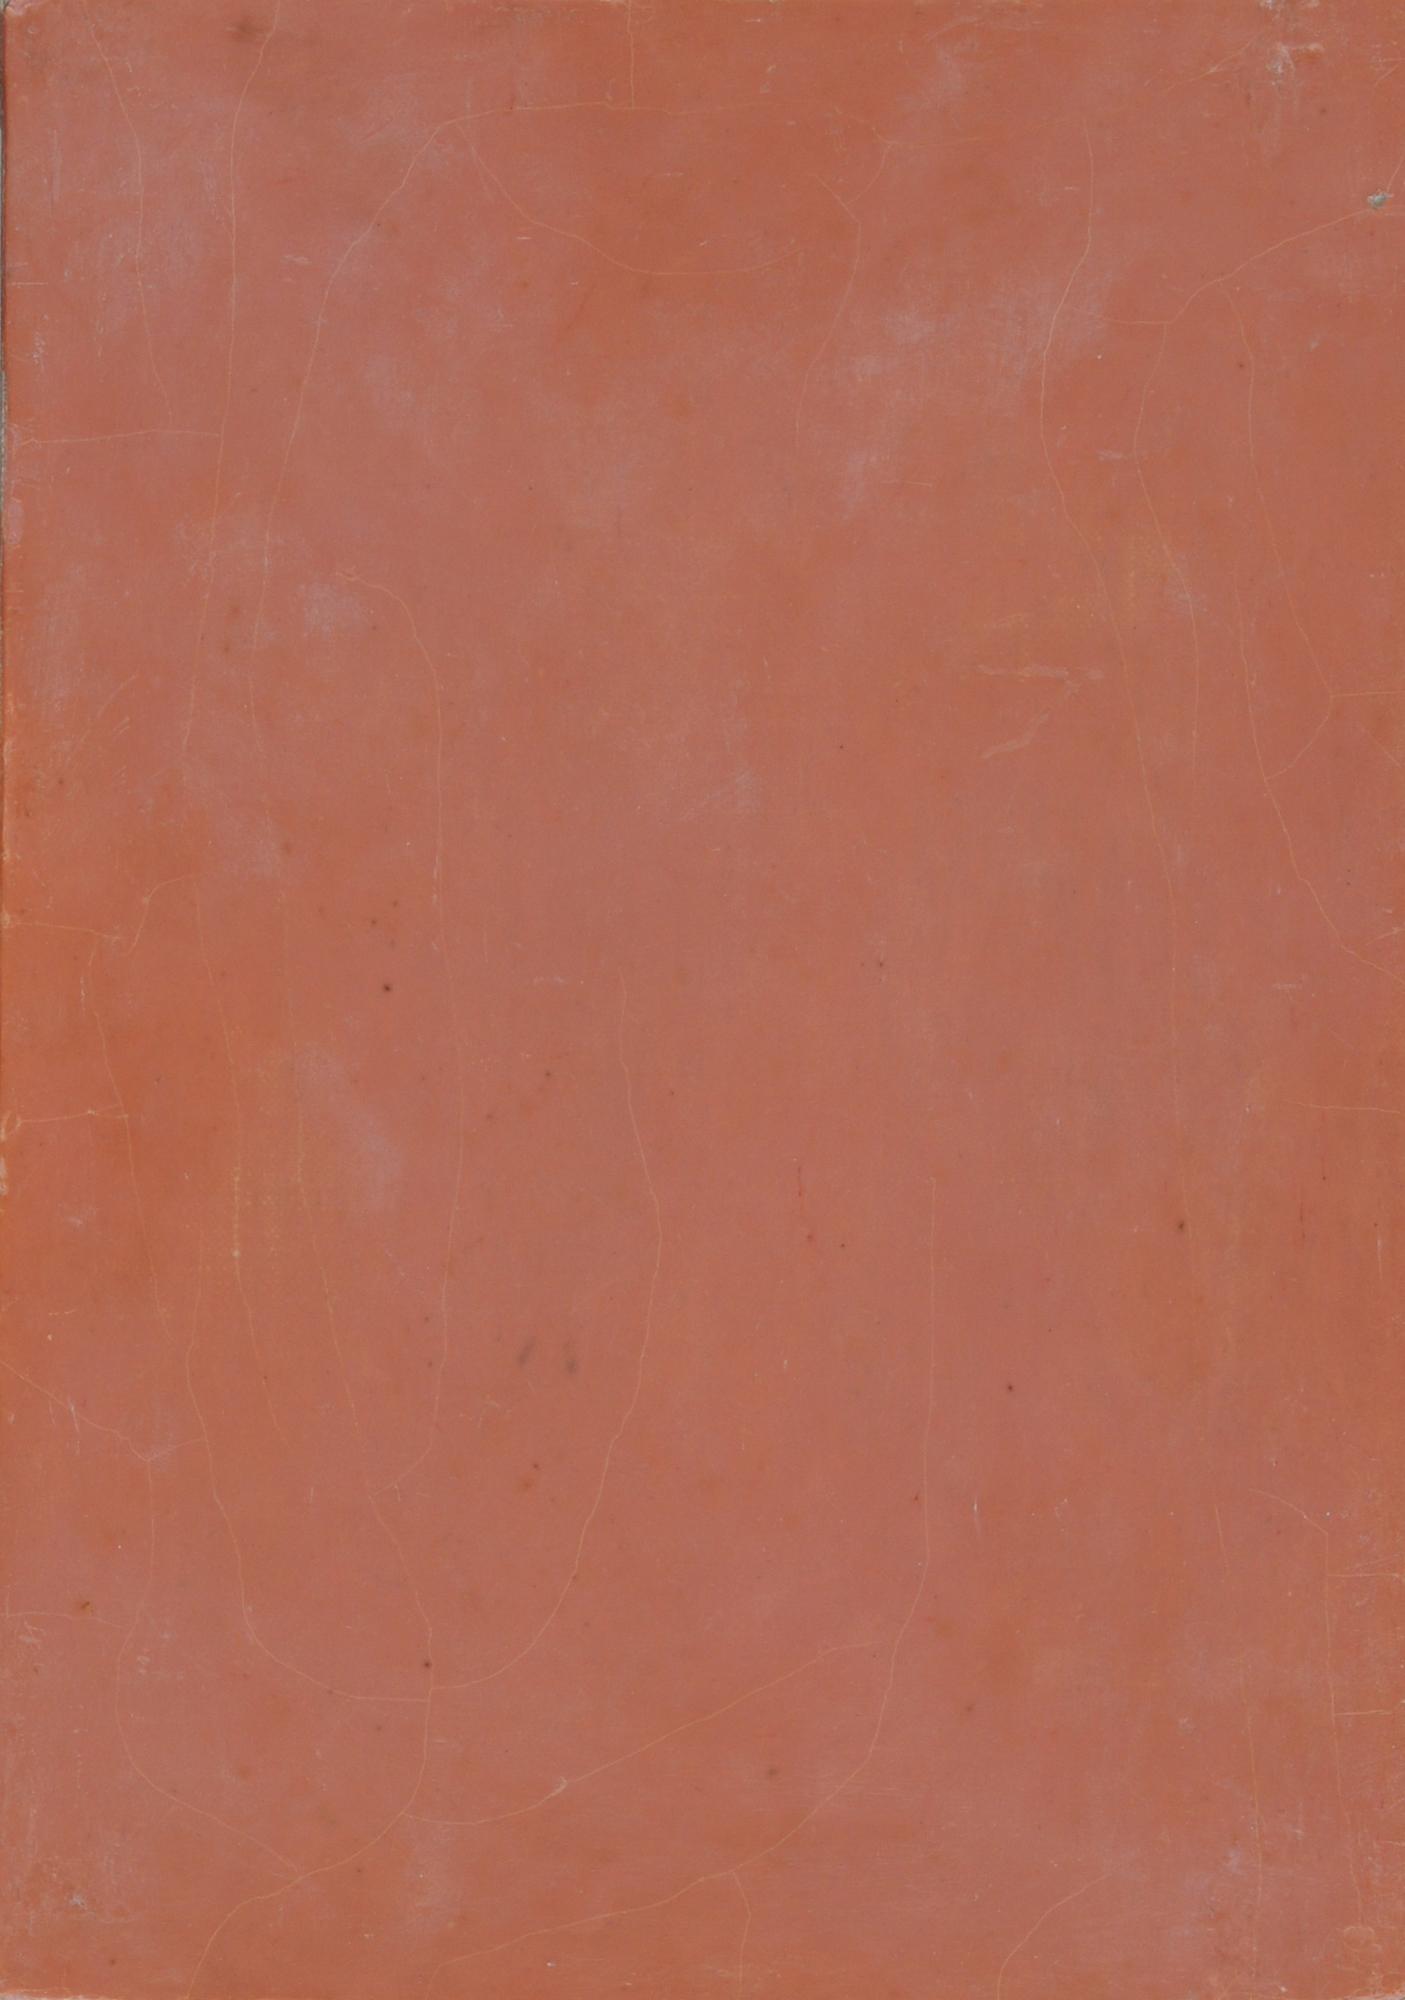 Gritsch Stefan, 2 works. Untitled, 1991; Untitled